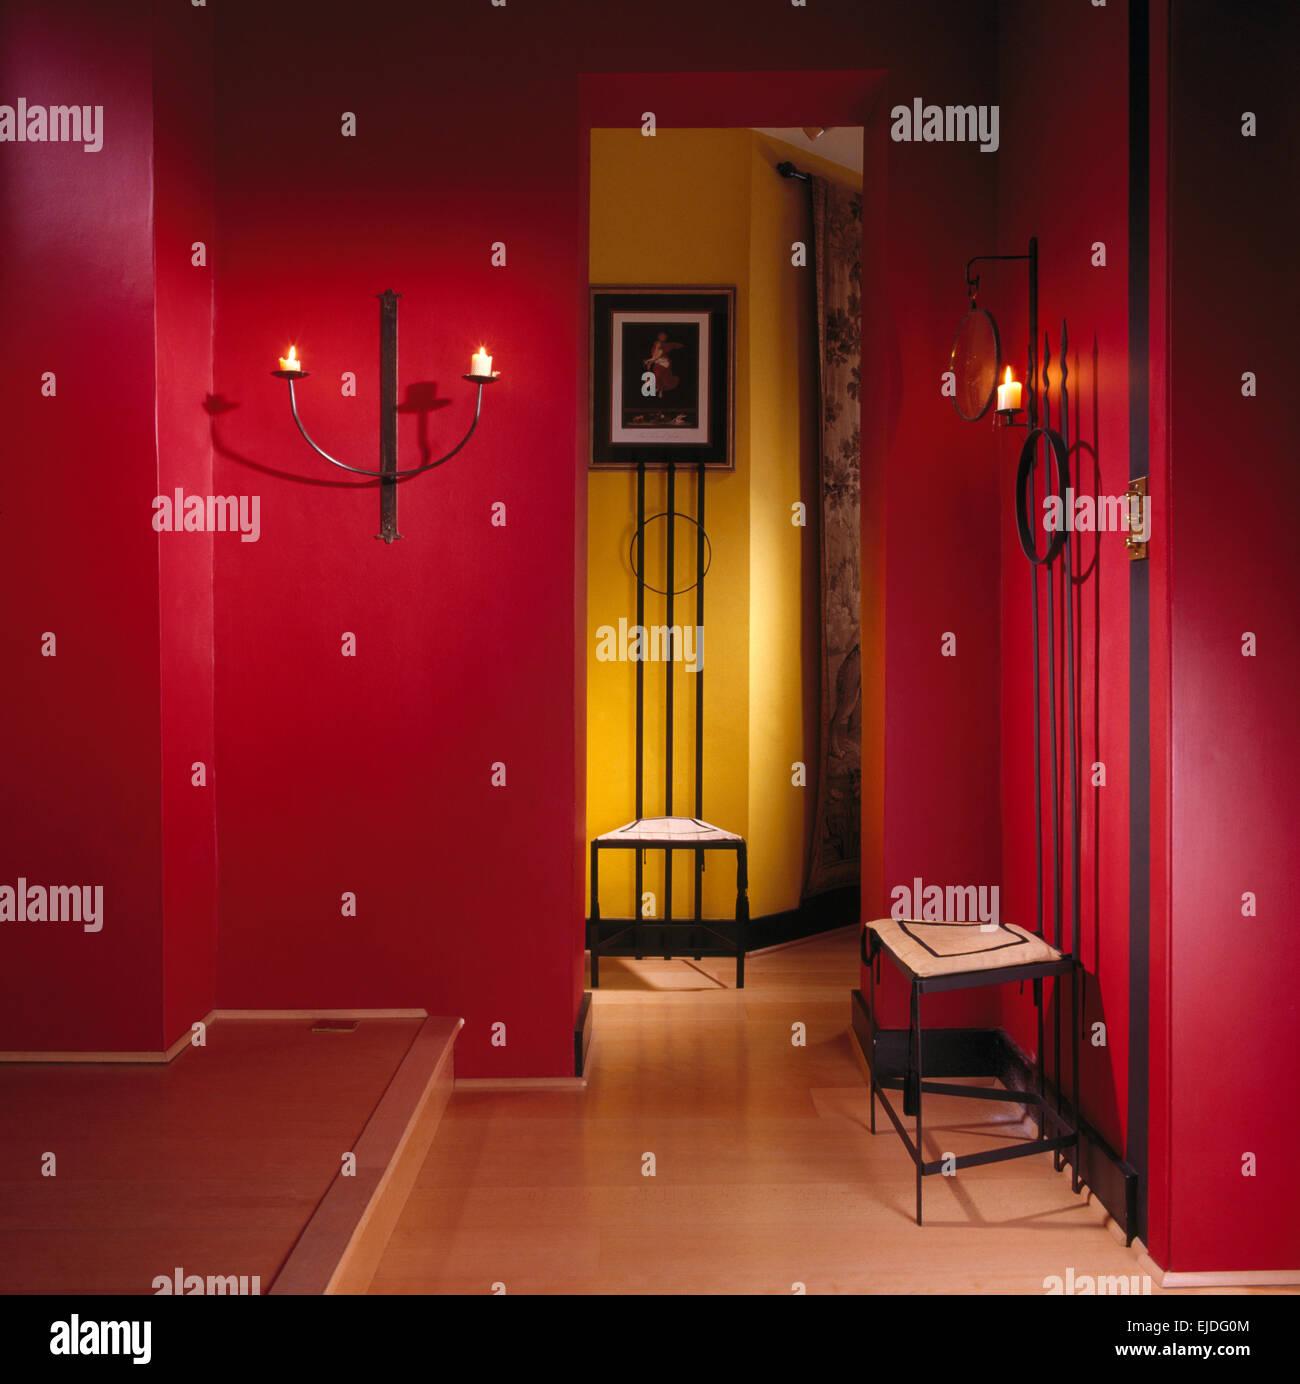 Farbduo An Der Wand Rot Und Grau: Interiors Town Halls Domestic Stockfotos & Interiors Town